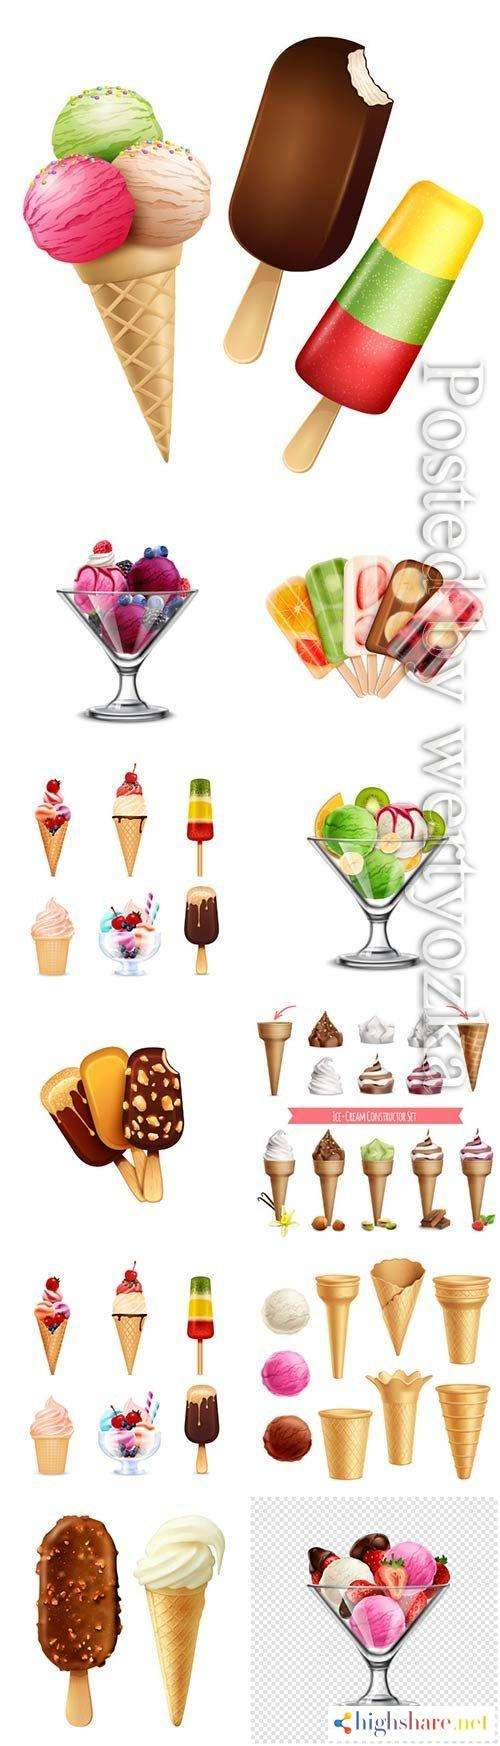 ice cream platter chocolate and vanilla ice cream with berries in vector 5f420112c4cee - Ice cream platter, chocolate and vanilla ice cream with berries in vector